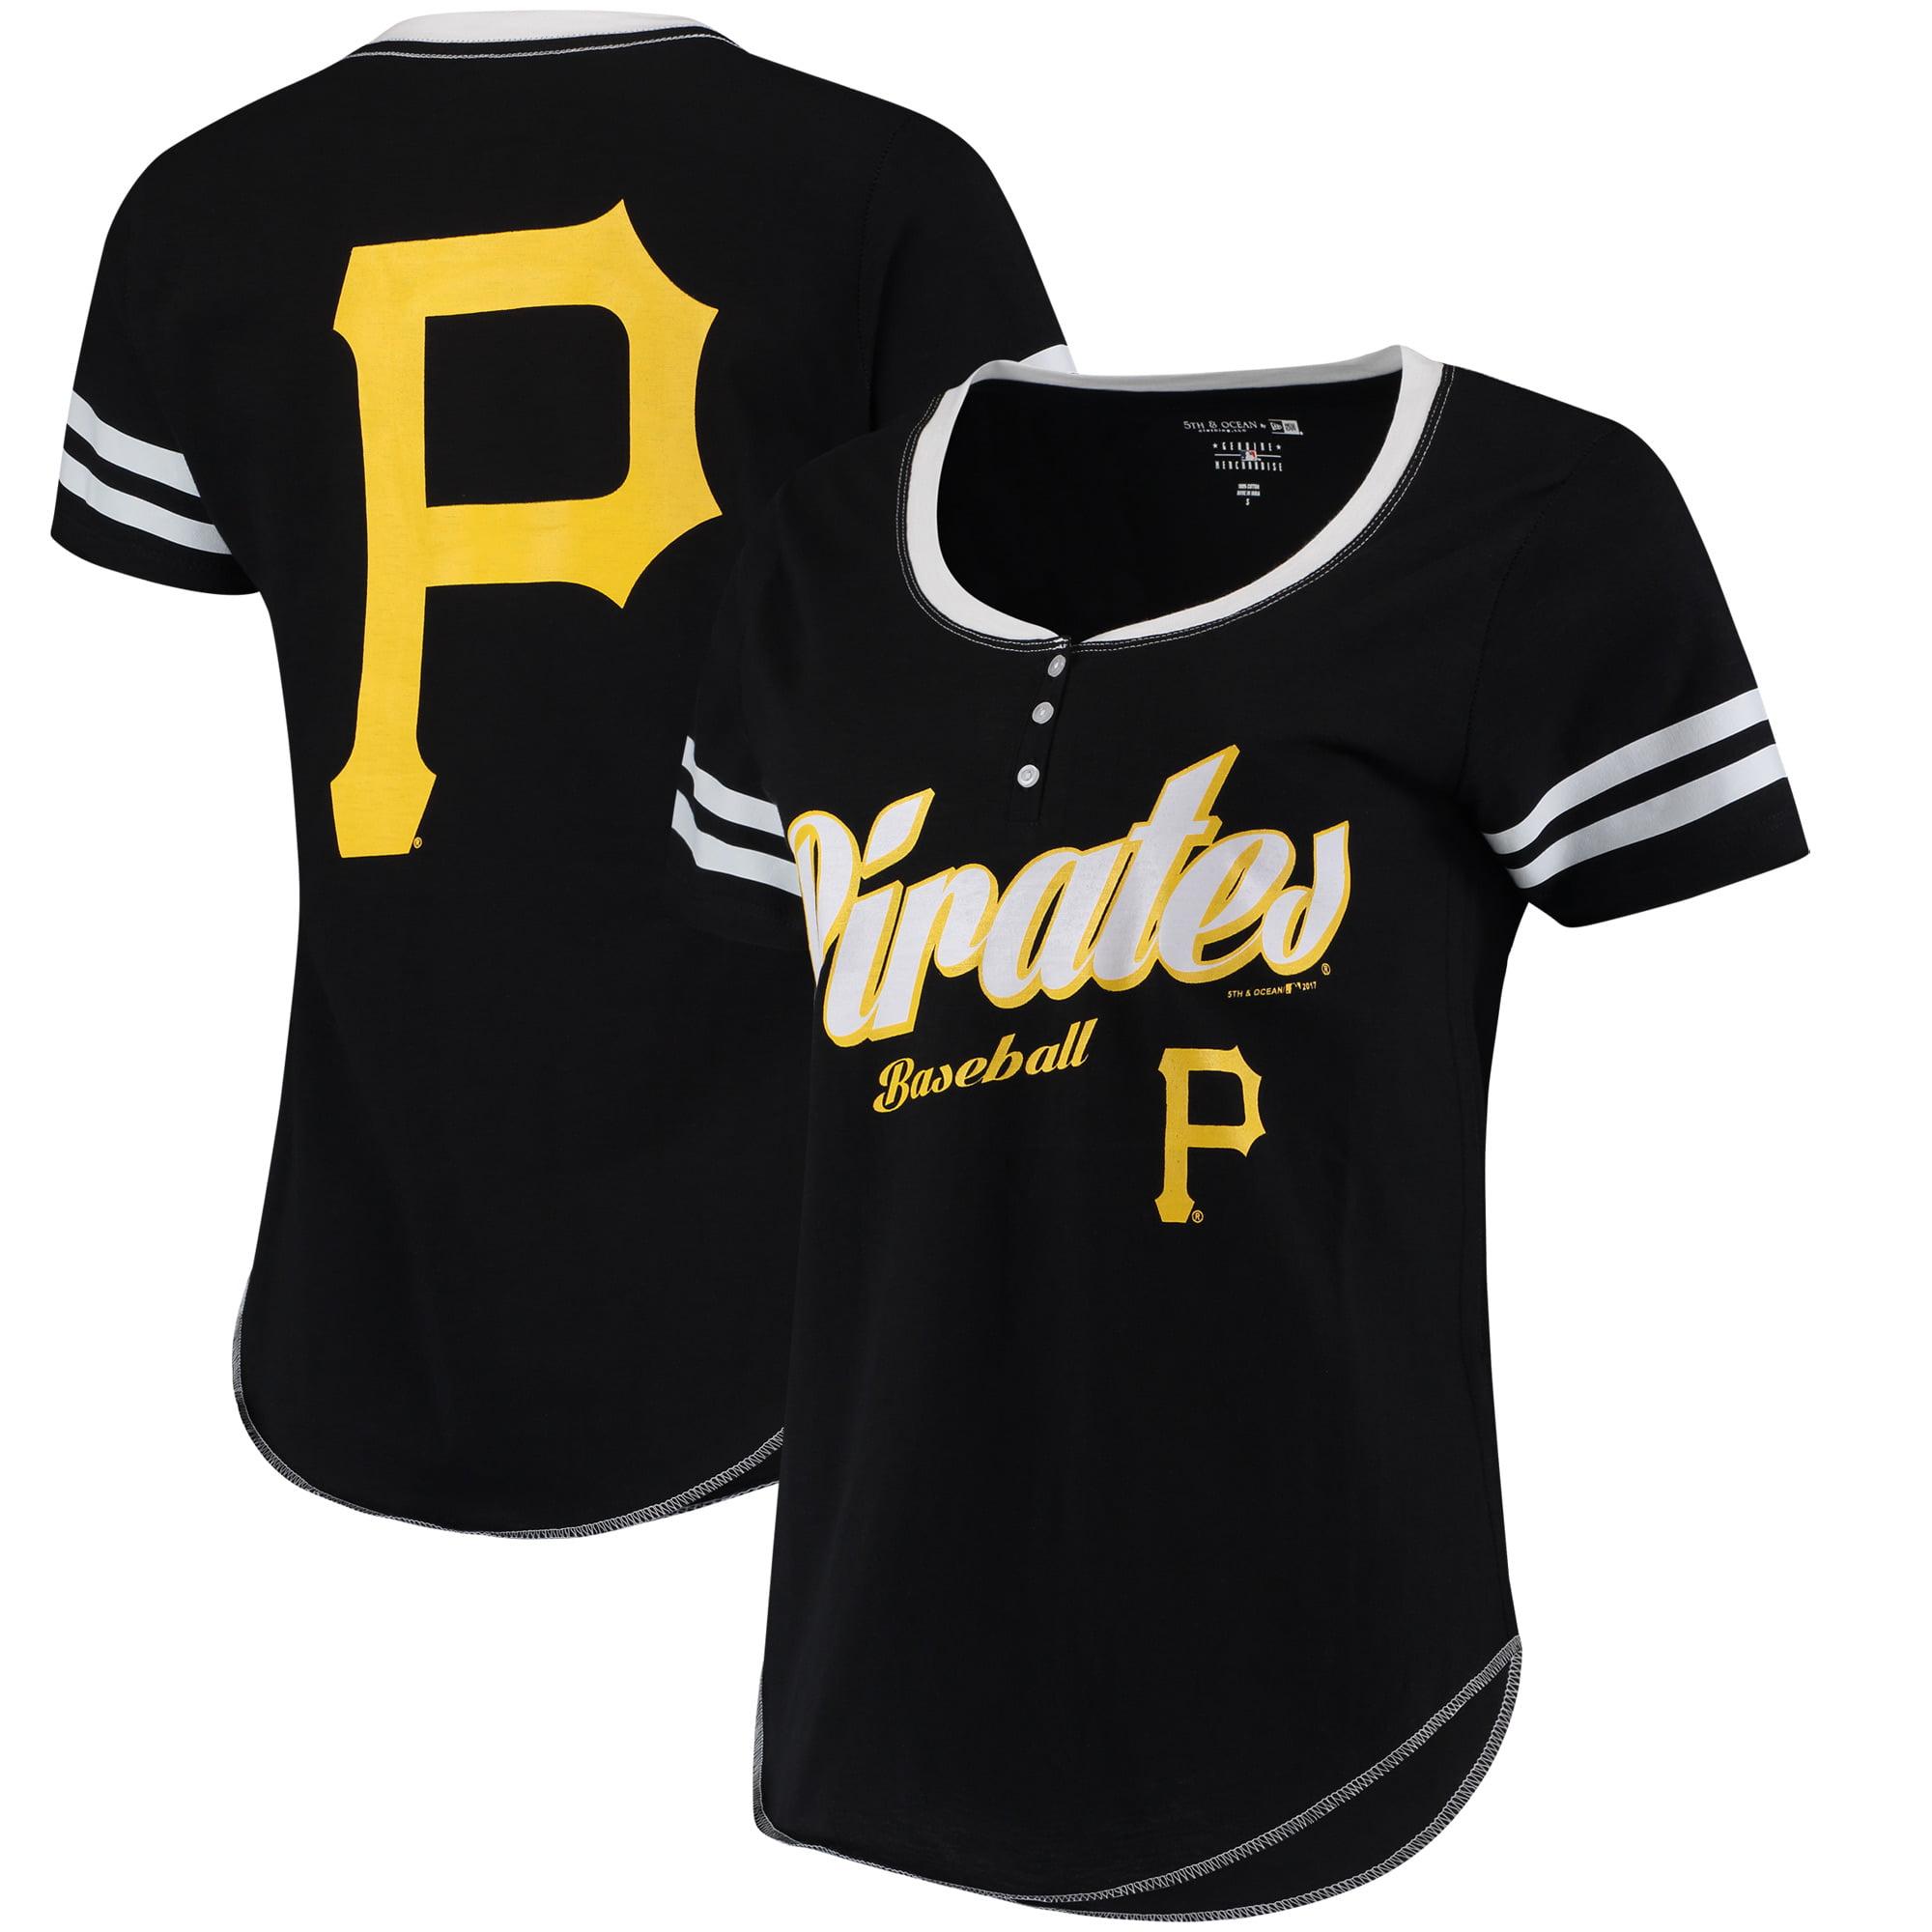 Pittsburgh Pirates 5th & Ocean by New Era Women's Slub Henley T-Shirt - Black/White